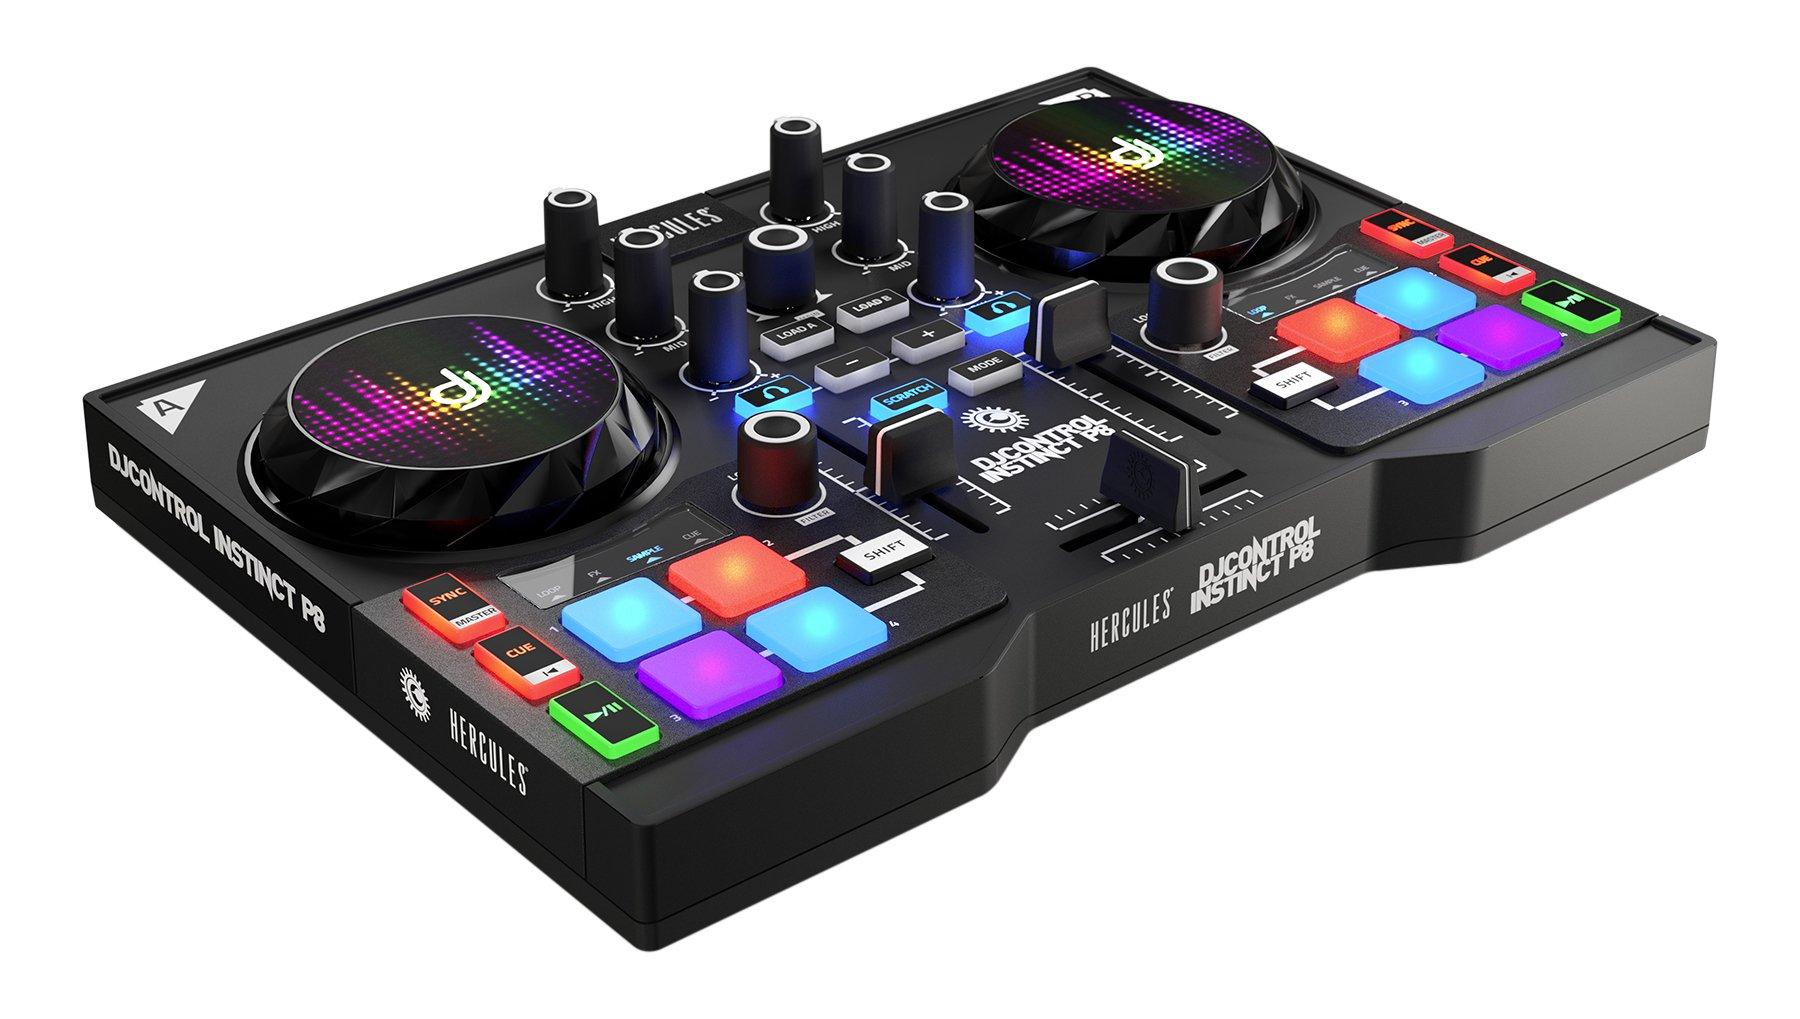 Hercules DJ 4780861 Djcontrol Instinct P8 DJ Controller, Black